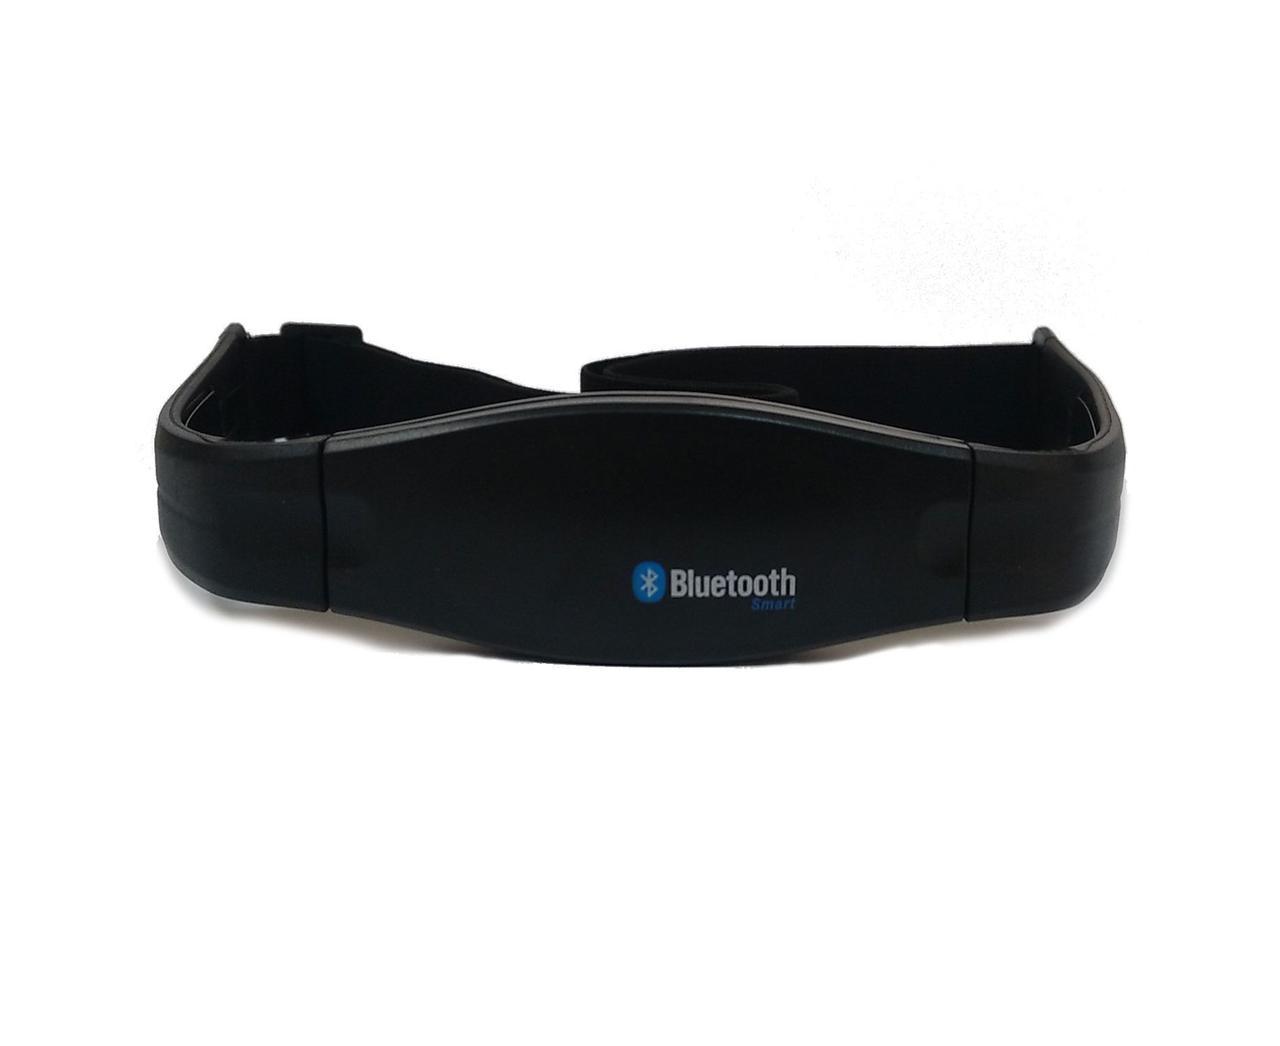 Нагрудный кардиопояс DFC W227Q (5кГц + Bluetooth) - фото 4